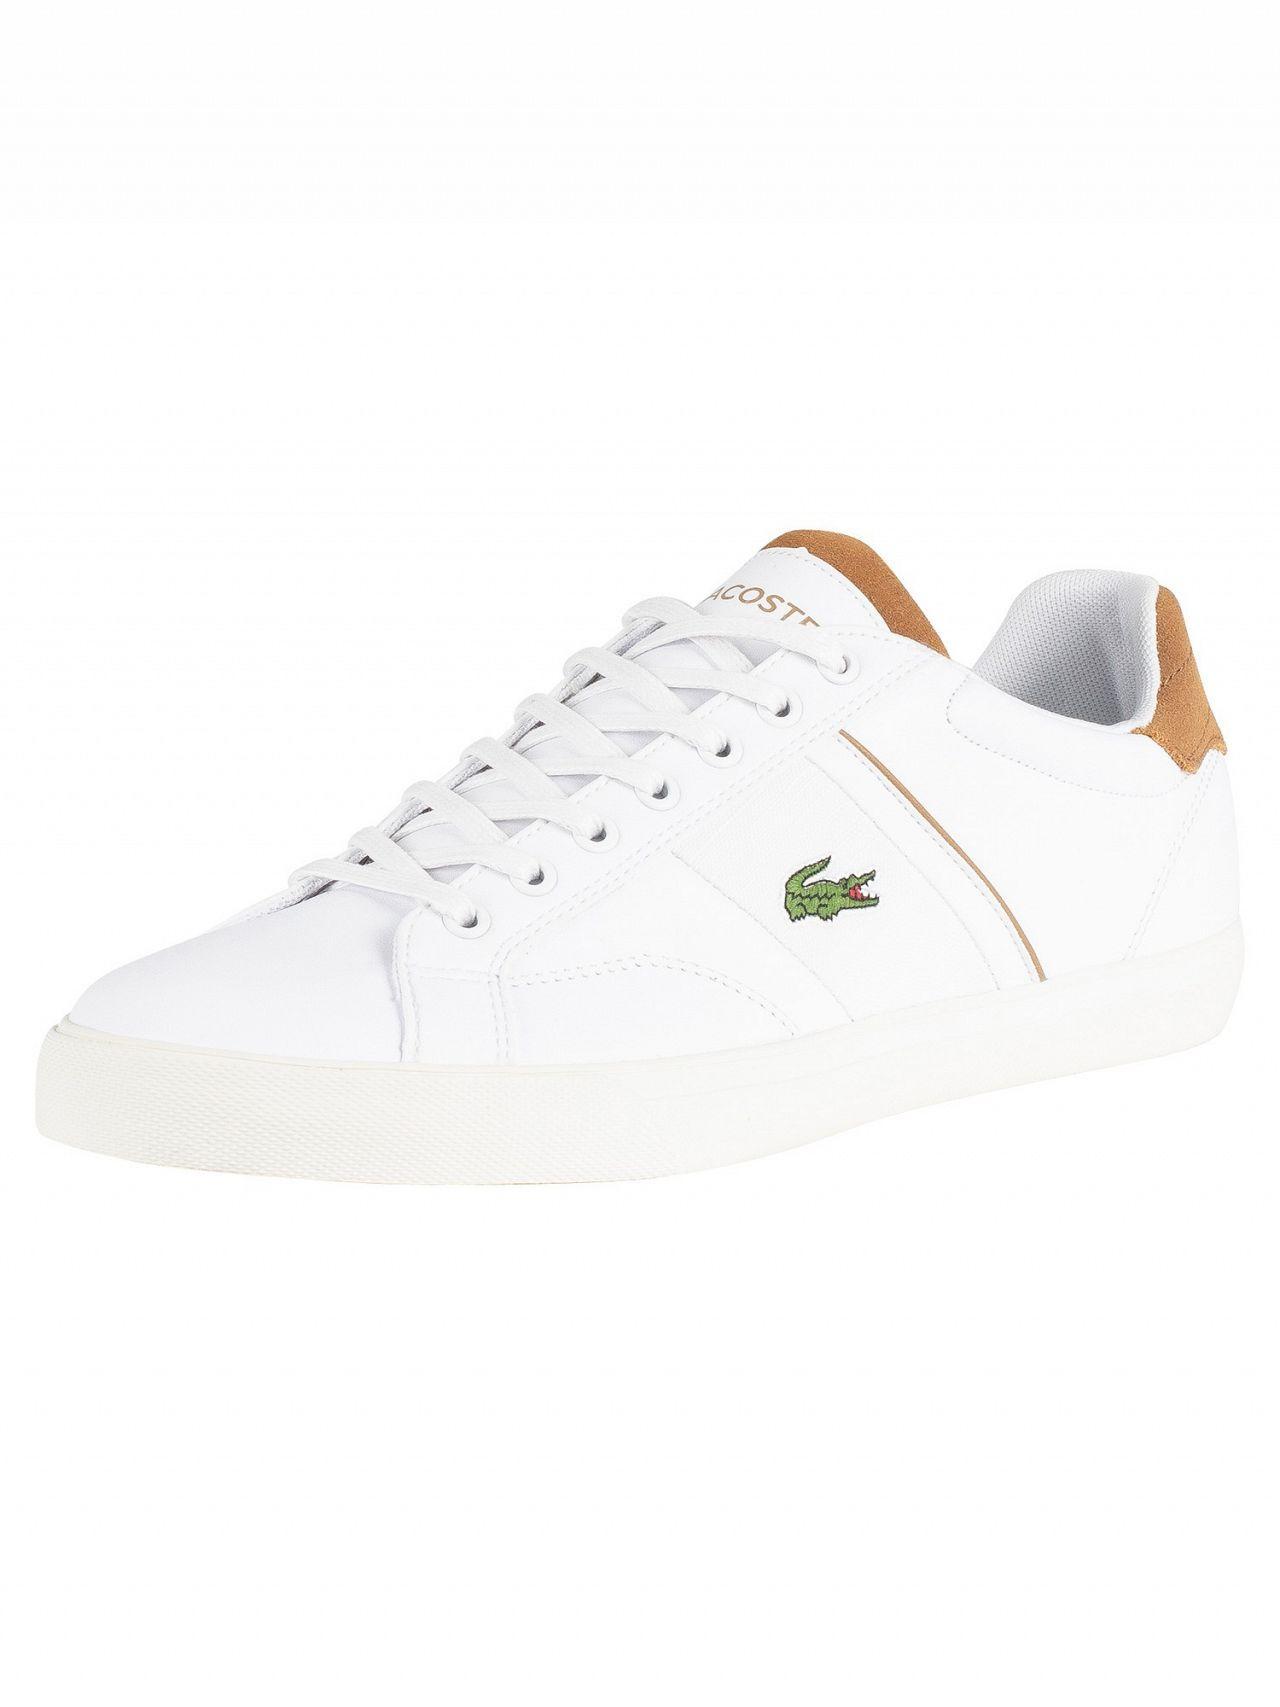 02253e7b07a727 Lyst - Lacoste White light Brown Fairlead 119 1 Cma Leather Trainers ...